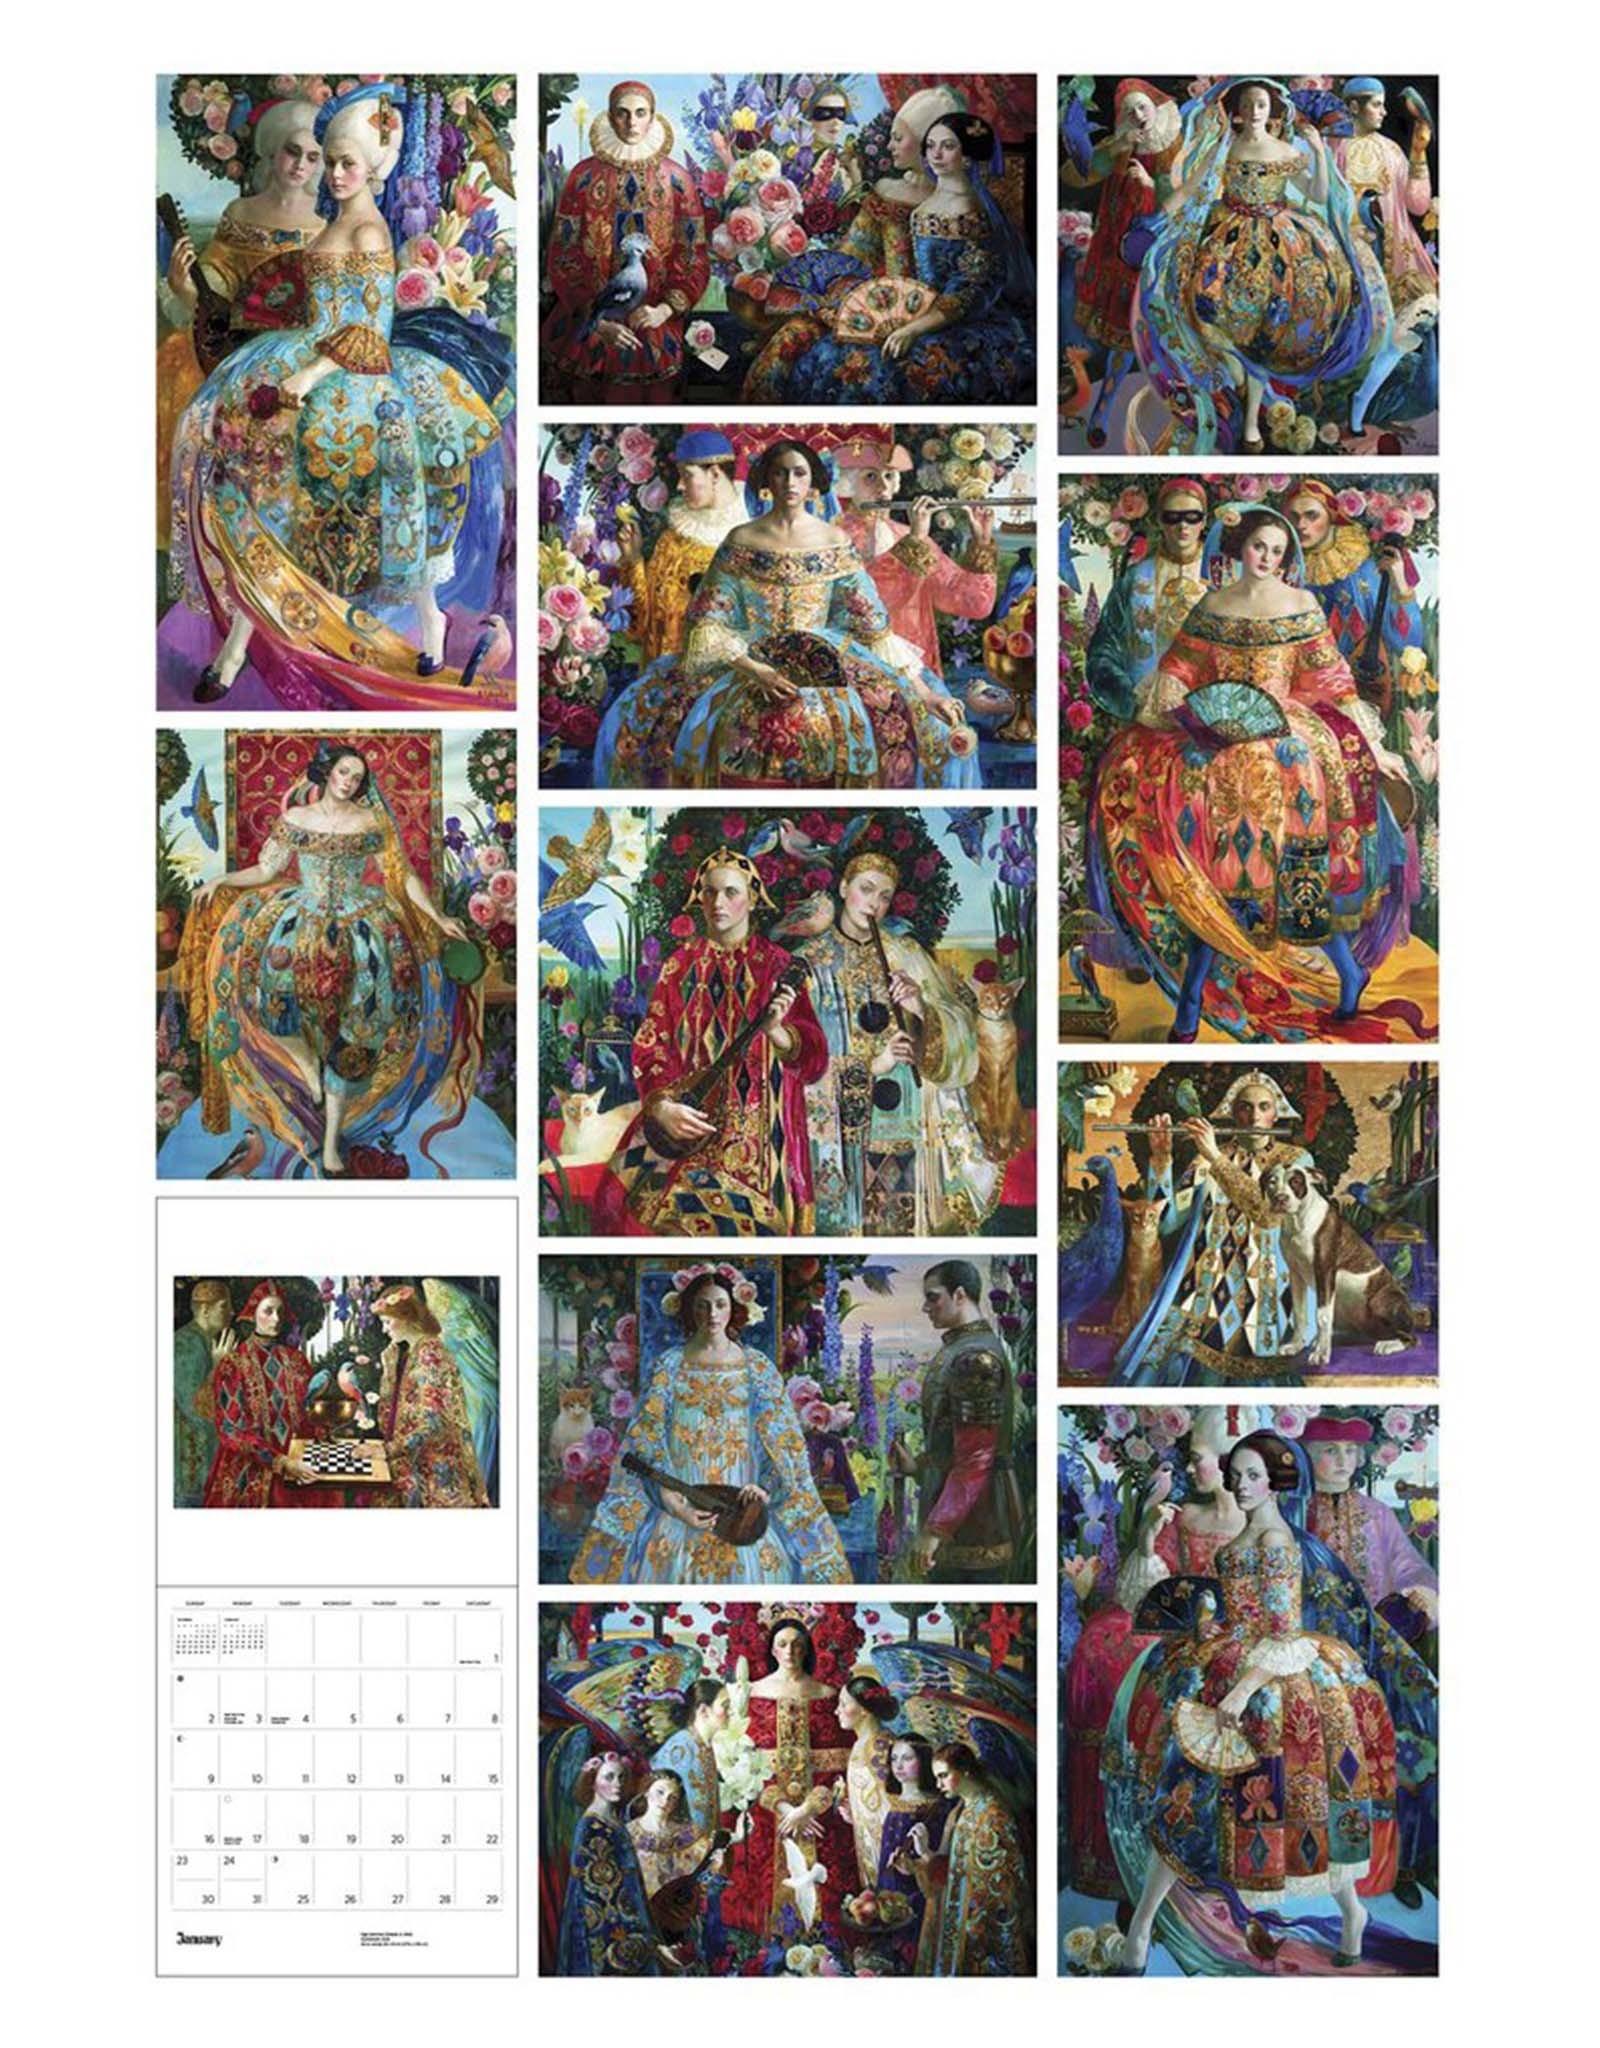 Commedia: Olga Suvorova 2022 Wall Calendar